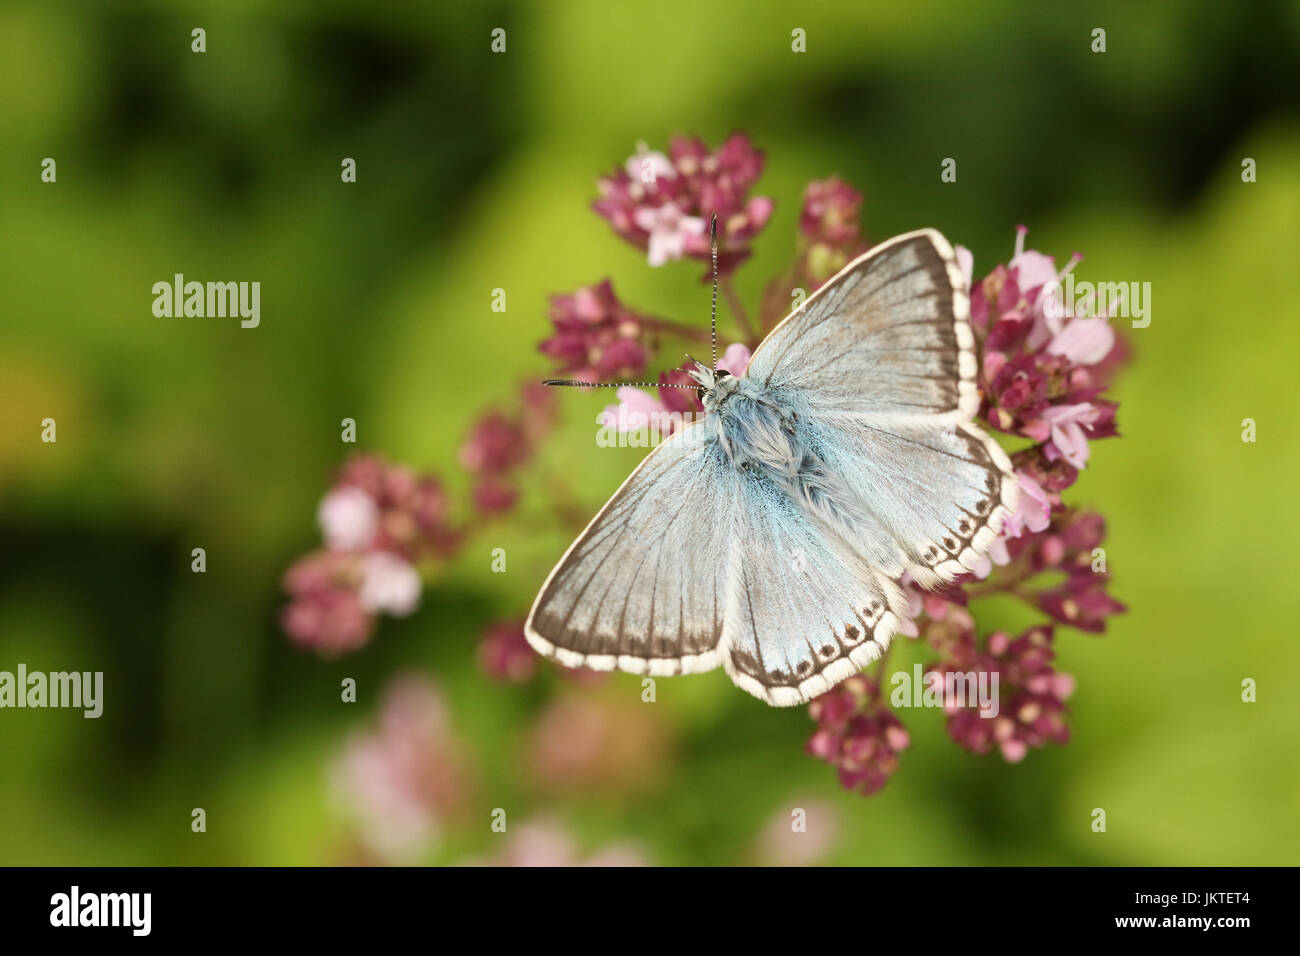 A pretty Chalk Hill Blue Butterfly (Polyommatus coridon) nectaring on a flower. - Stock Image